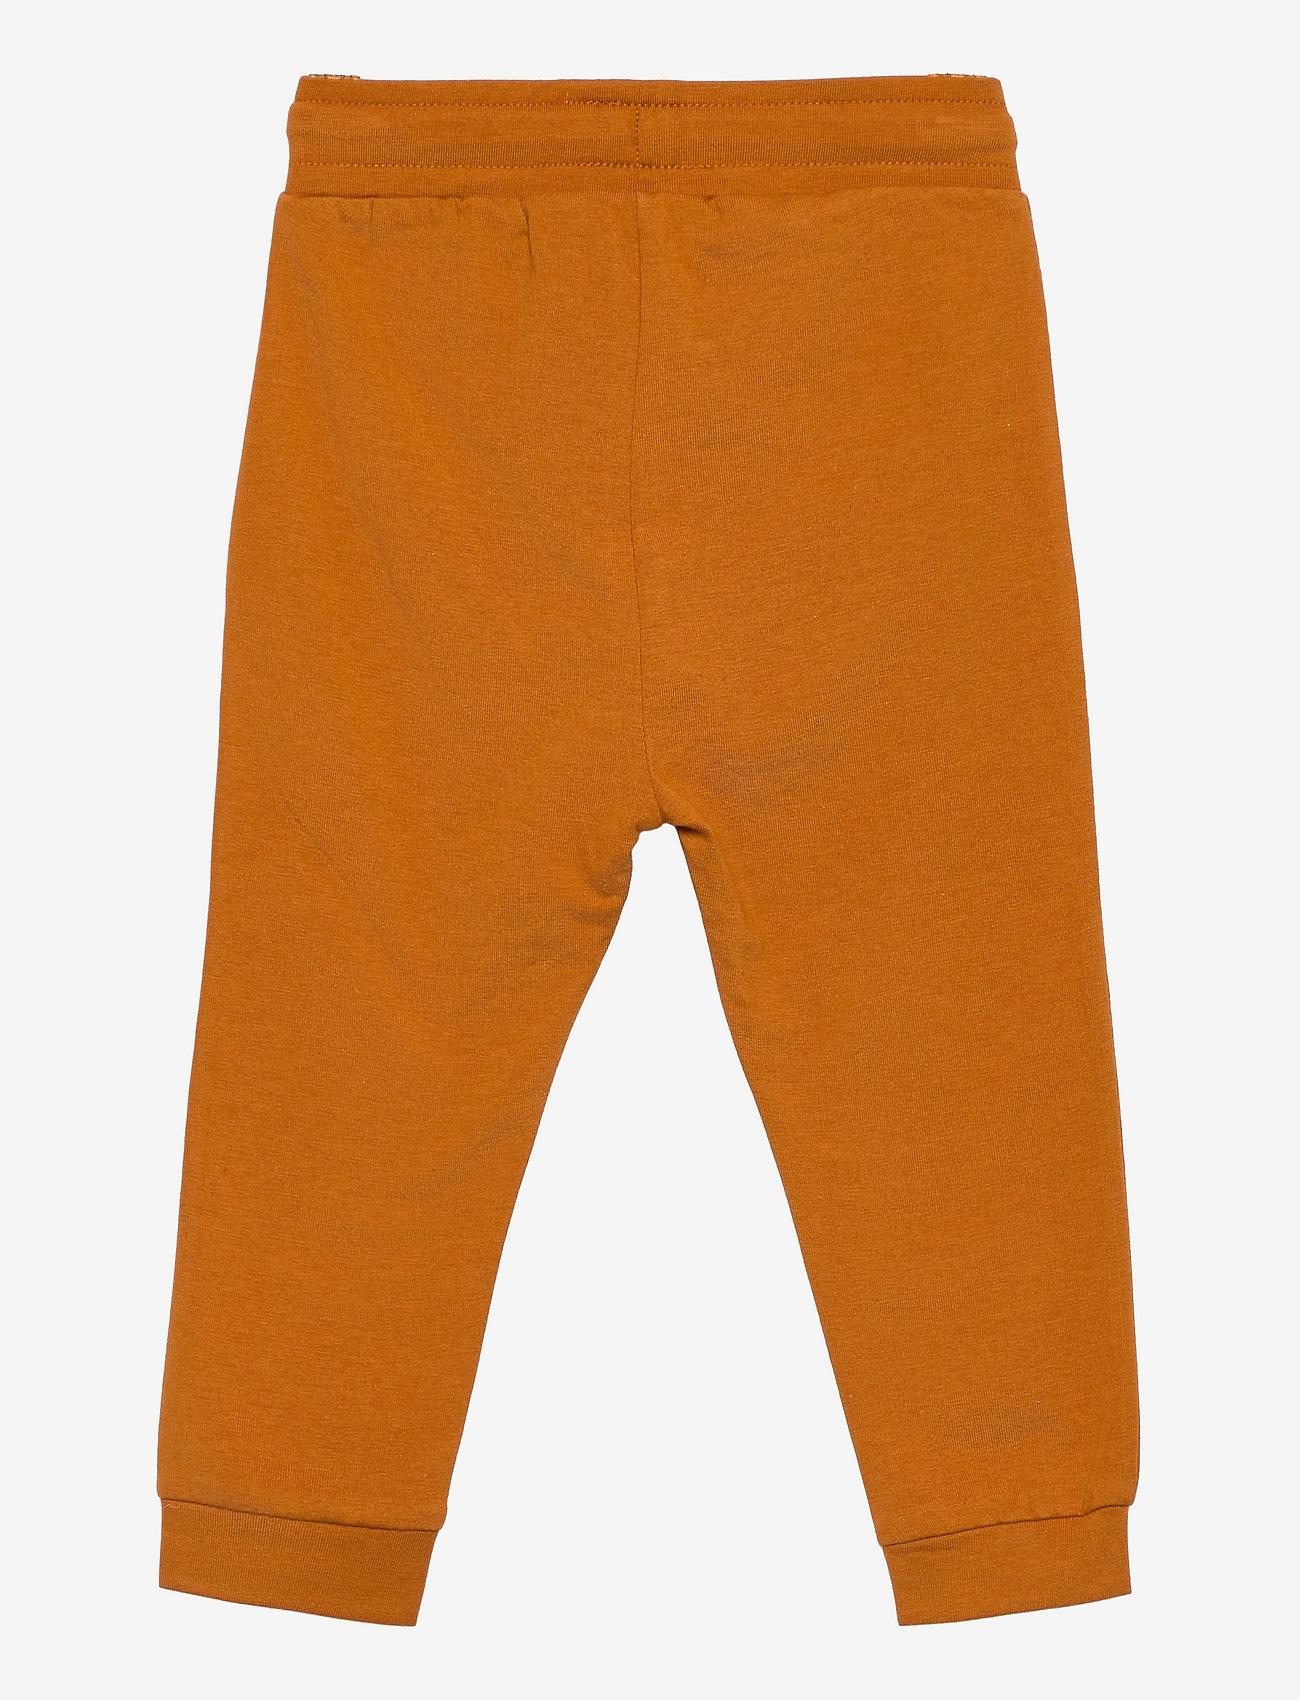 Hummel - hmlFUTTE PANTS - sports pants - pumpkin spice - 1